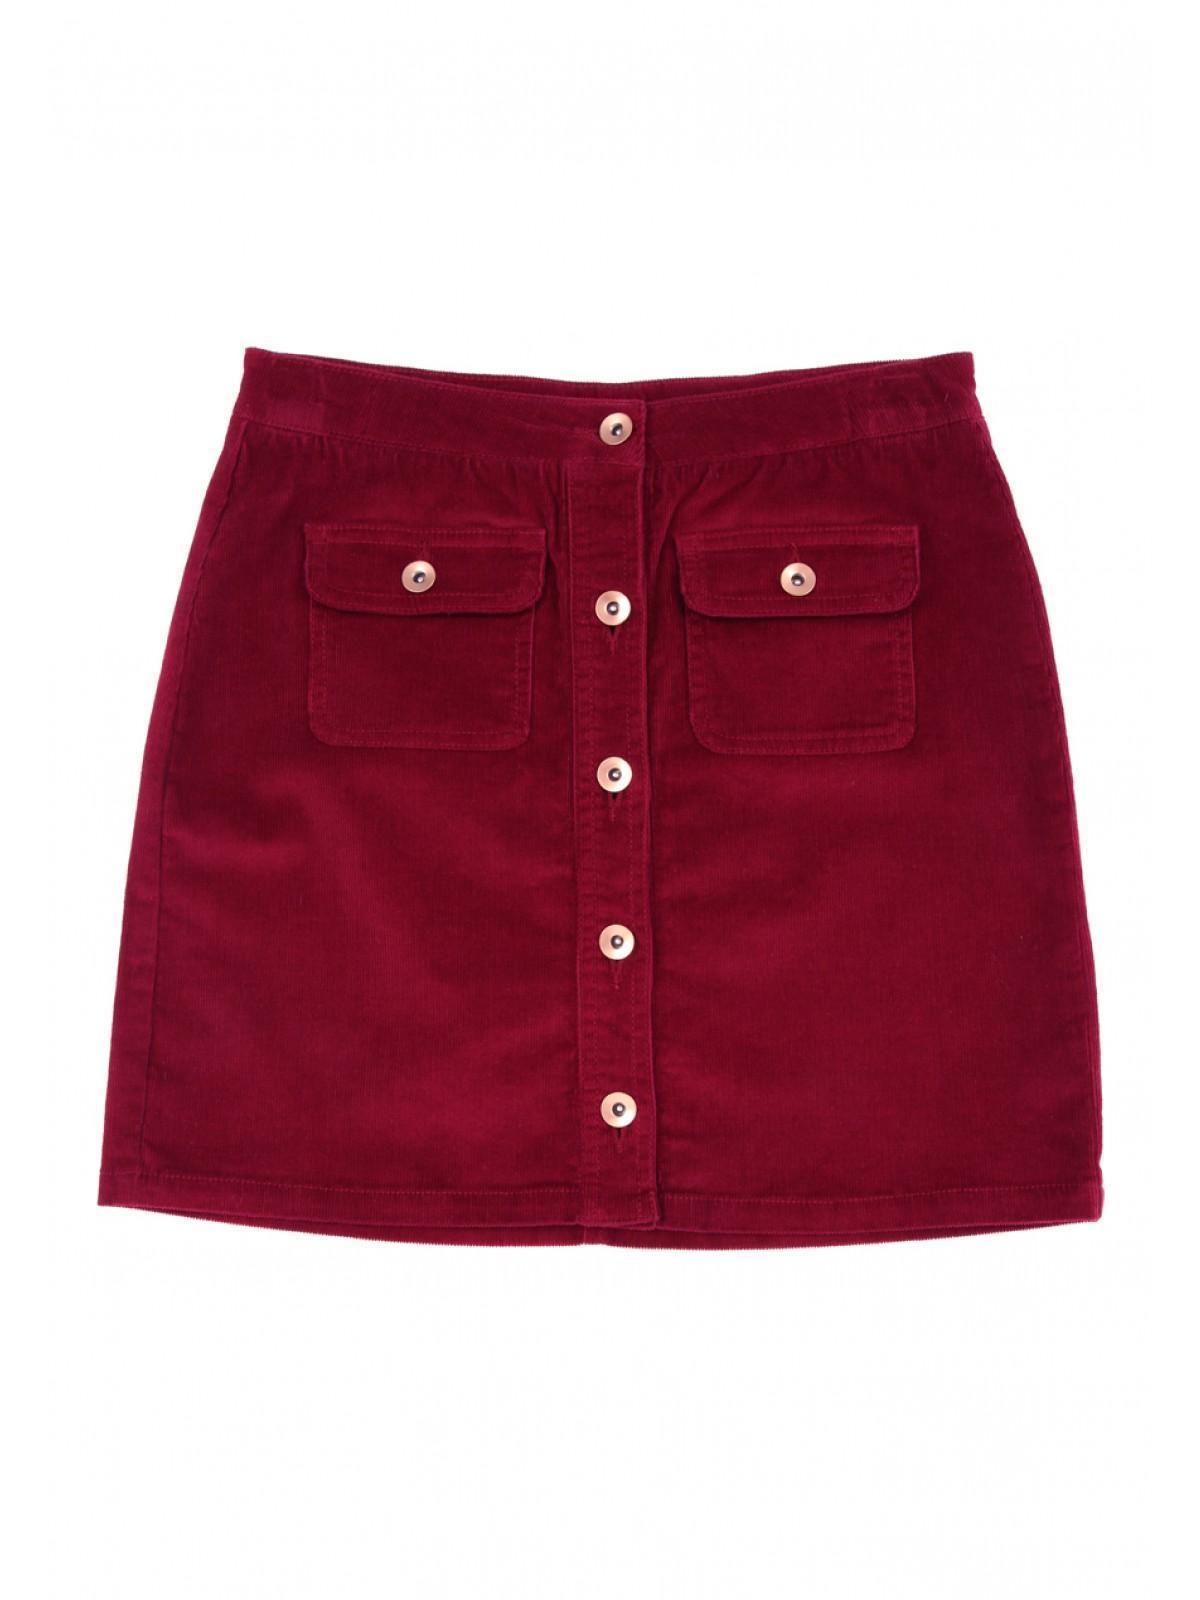 8e5561cc79 Girls Older Girls Purple Cord Button Through Skirt   Peacocks